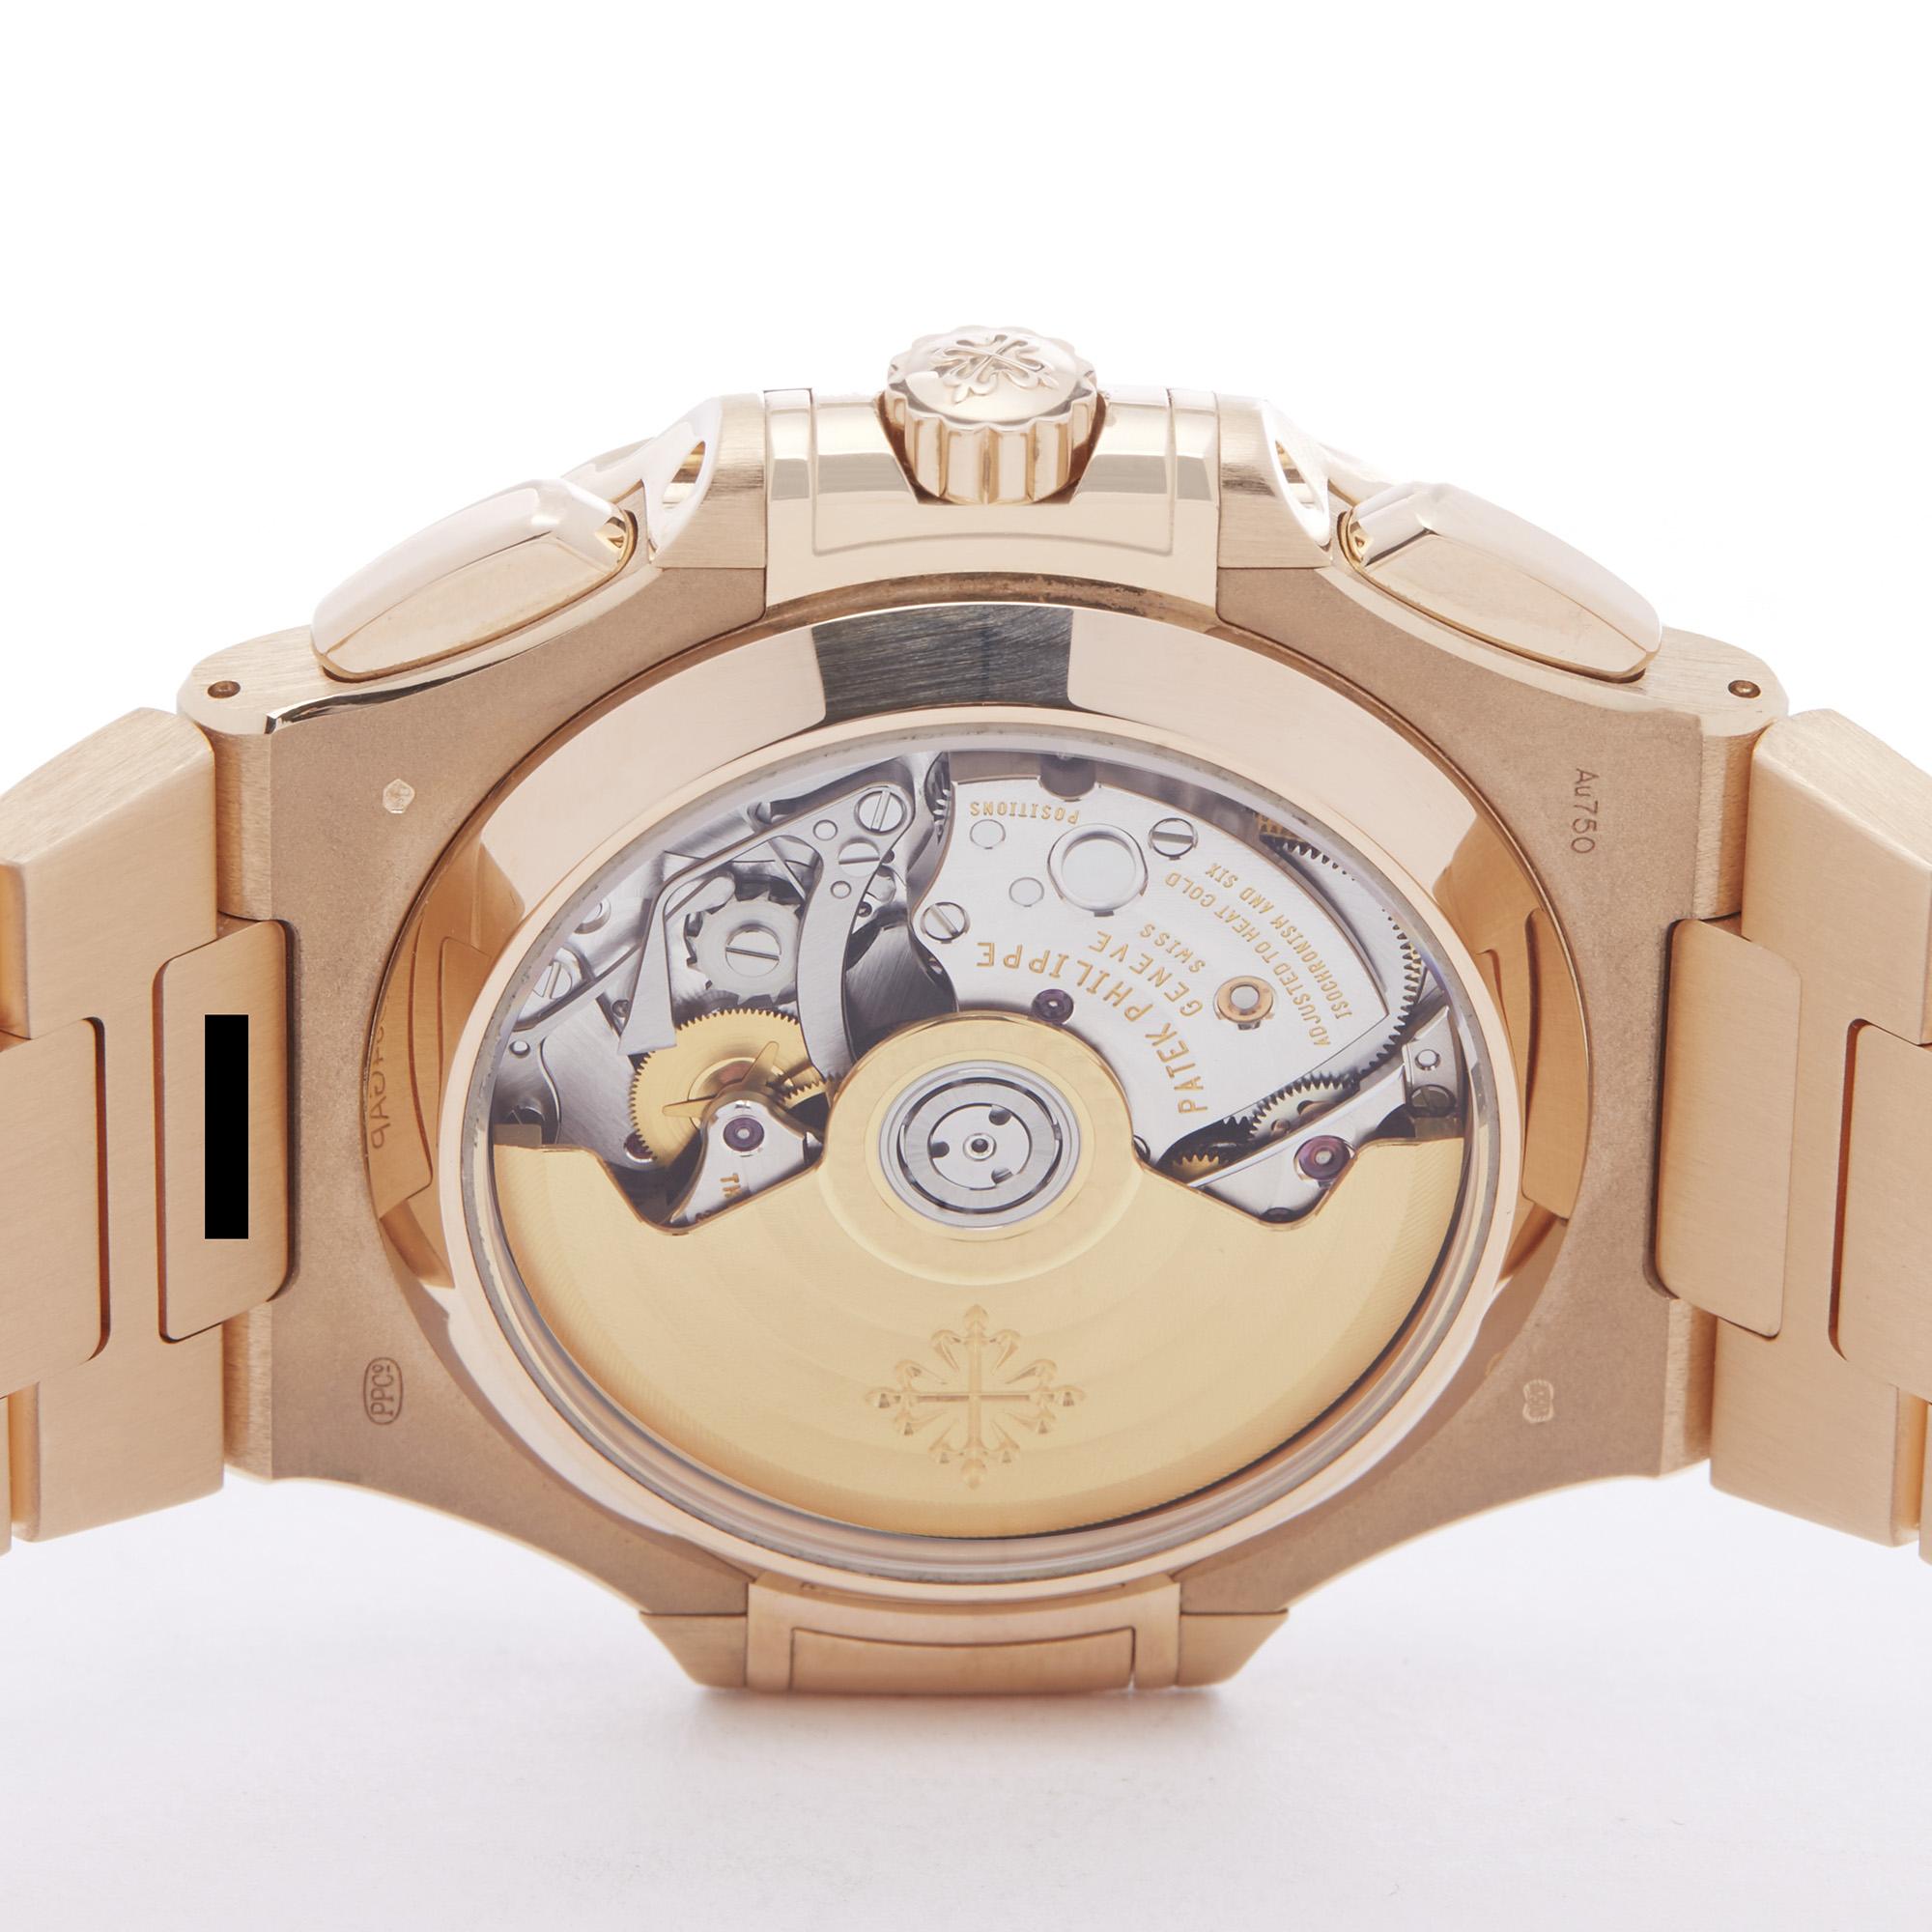 Patek Philippe Nautilus Chronograph 18k Rose Gold - 5980/1R-001 - Image 3 of 7